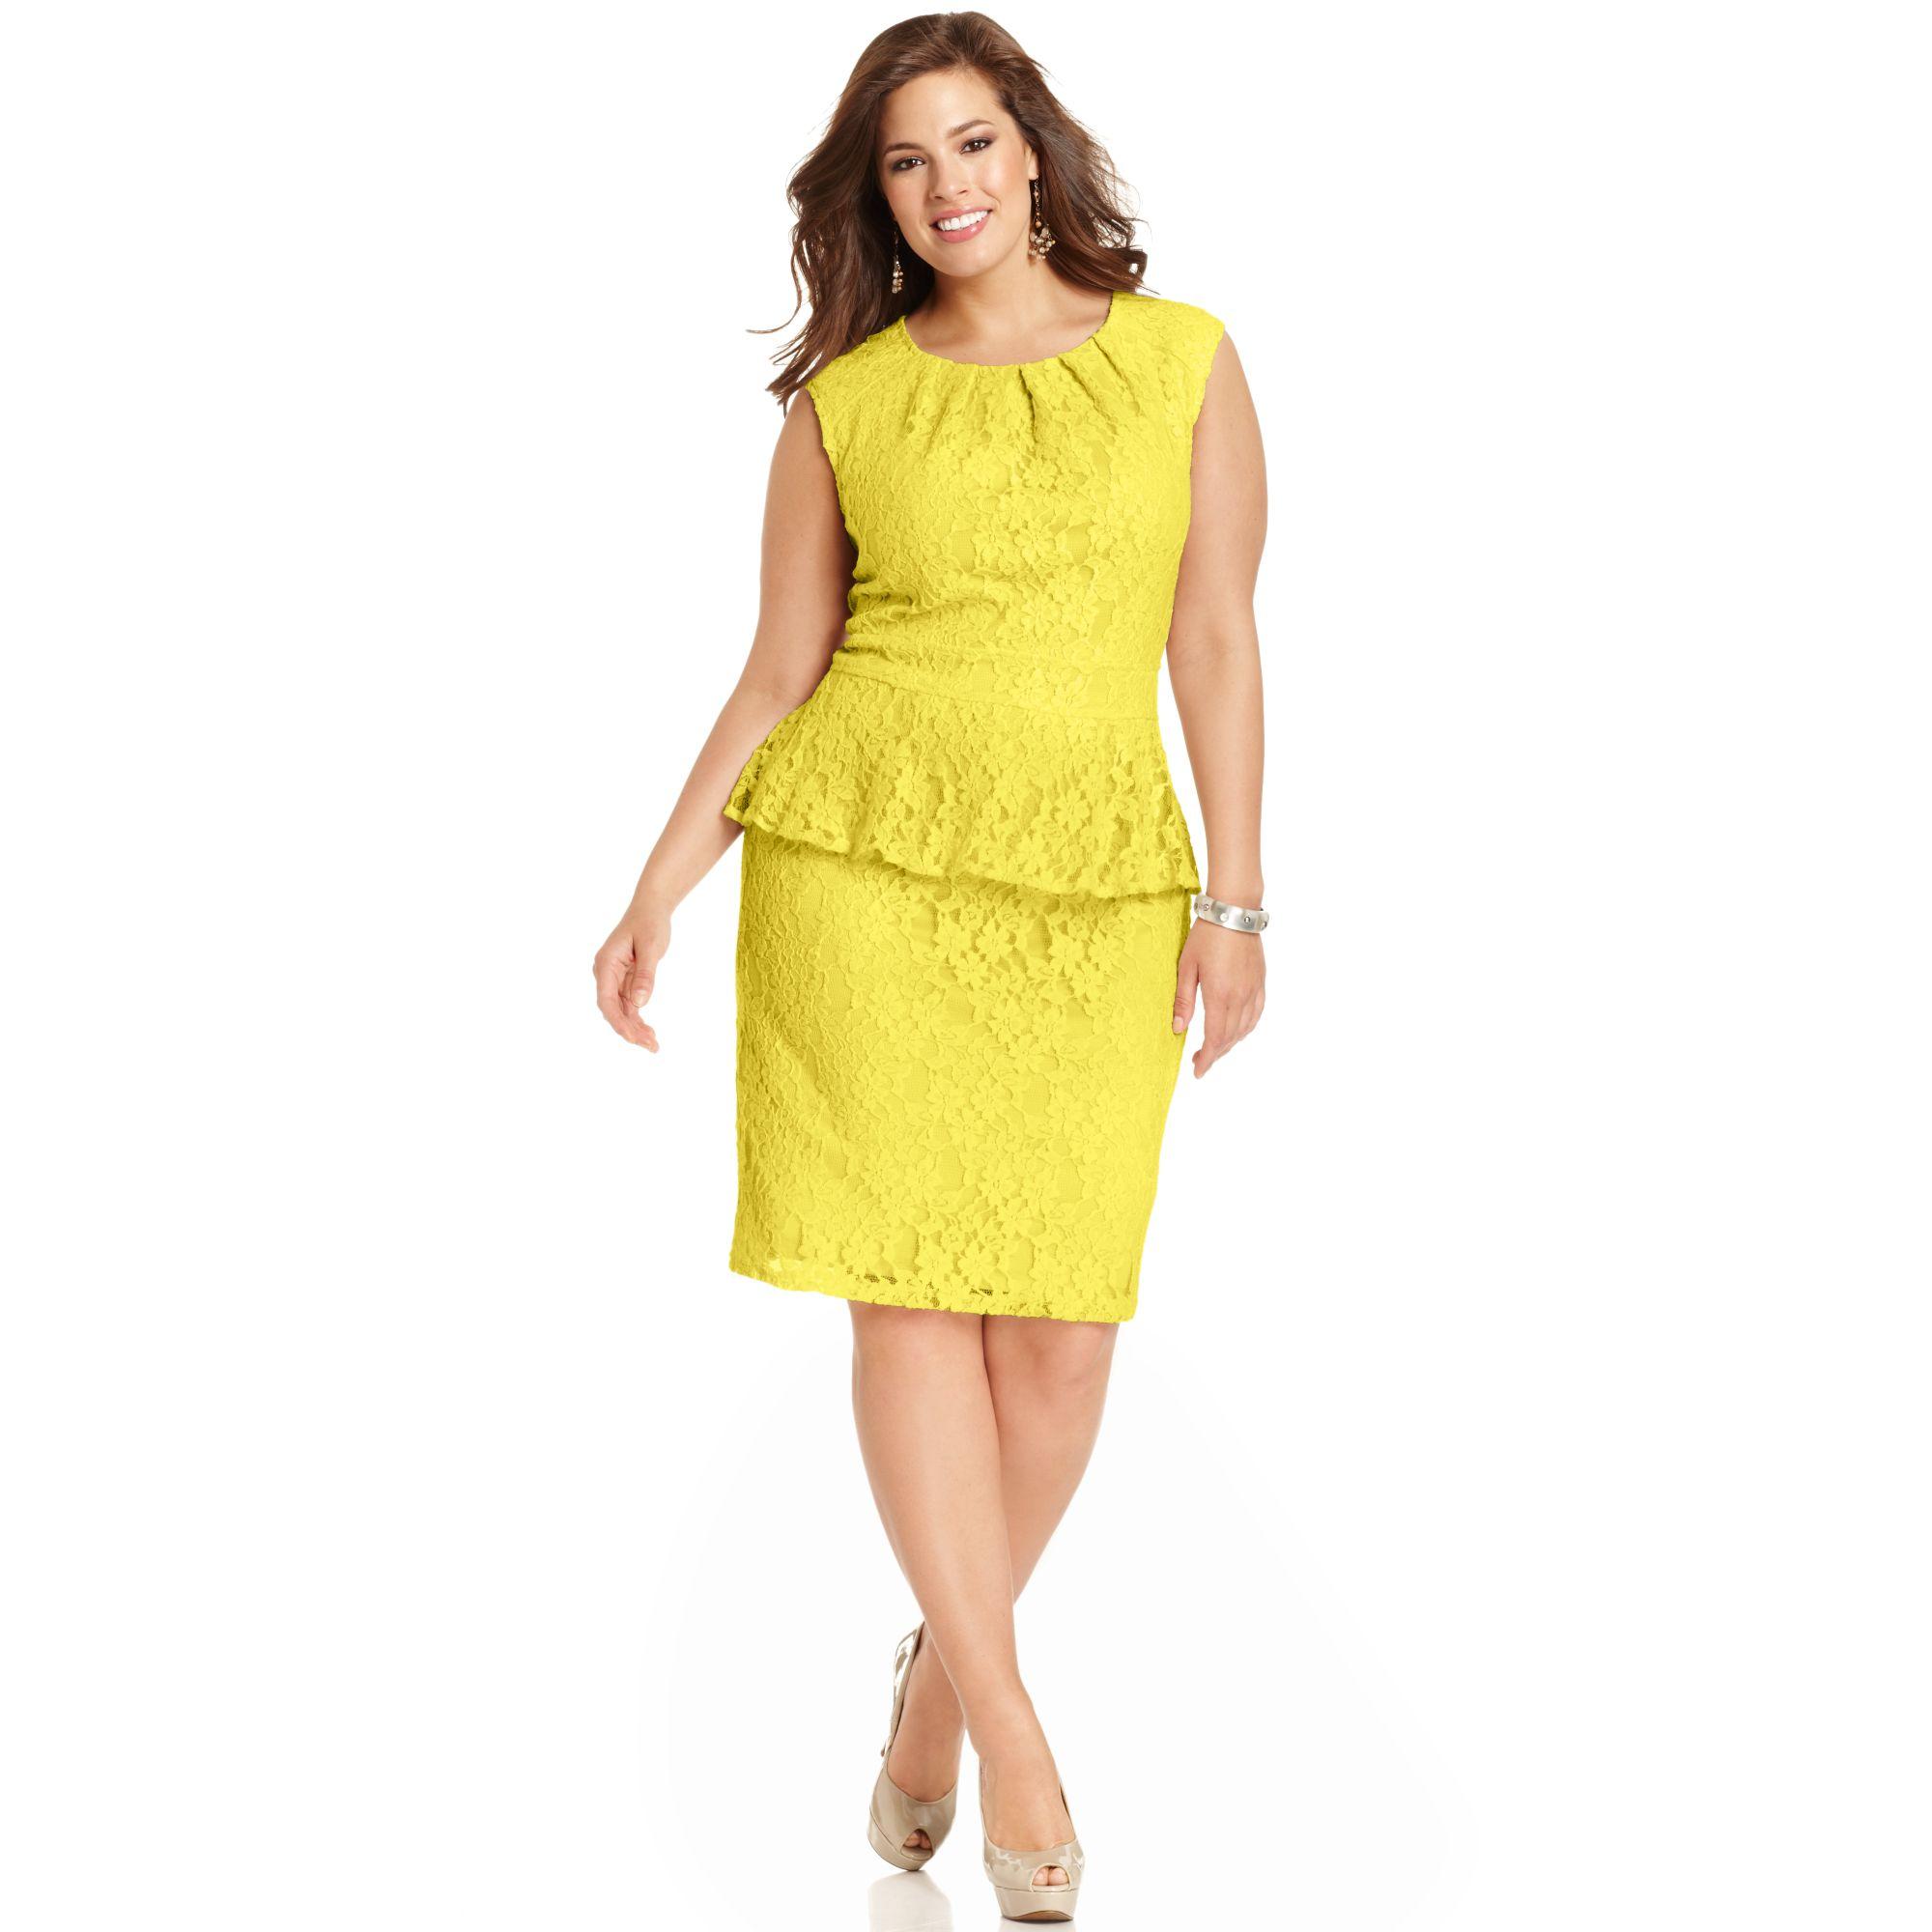 Lyst - Spense Plus Size Capsleeve Lace Peplum Dress in Yellow